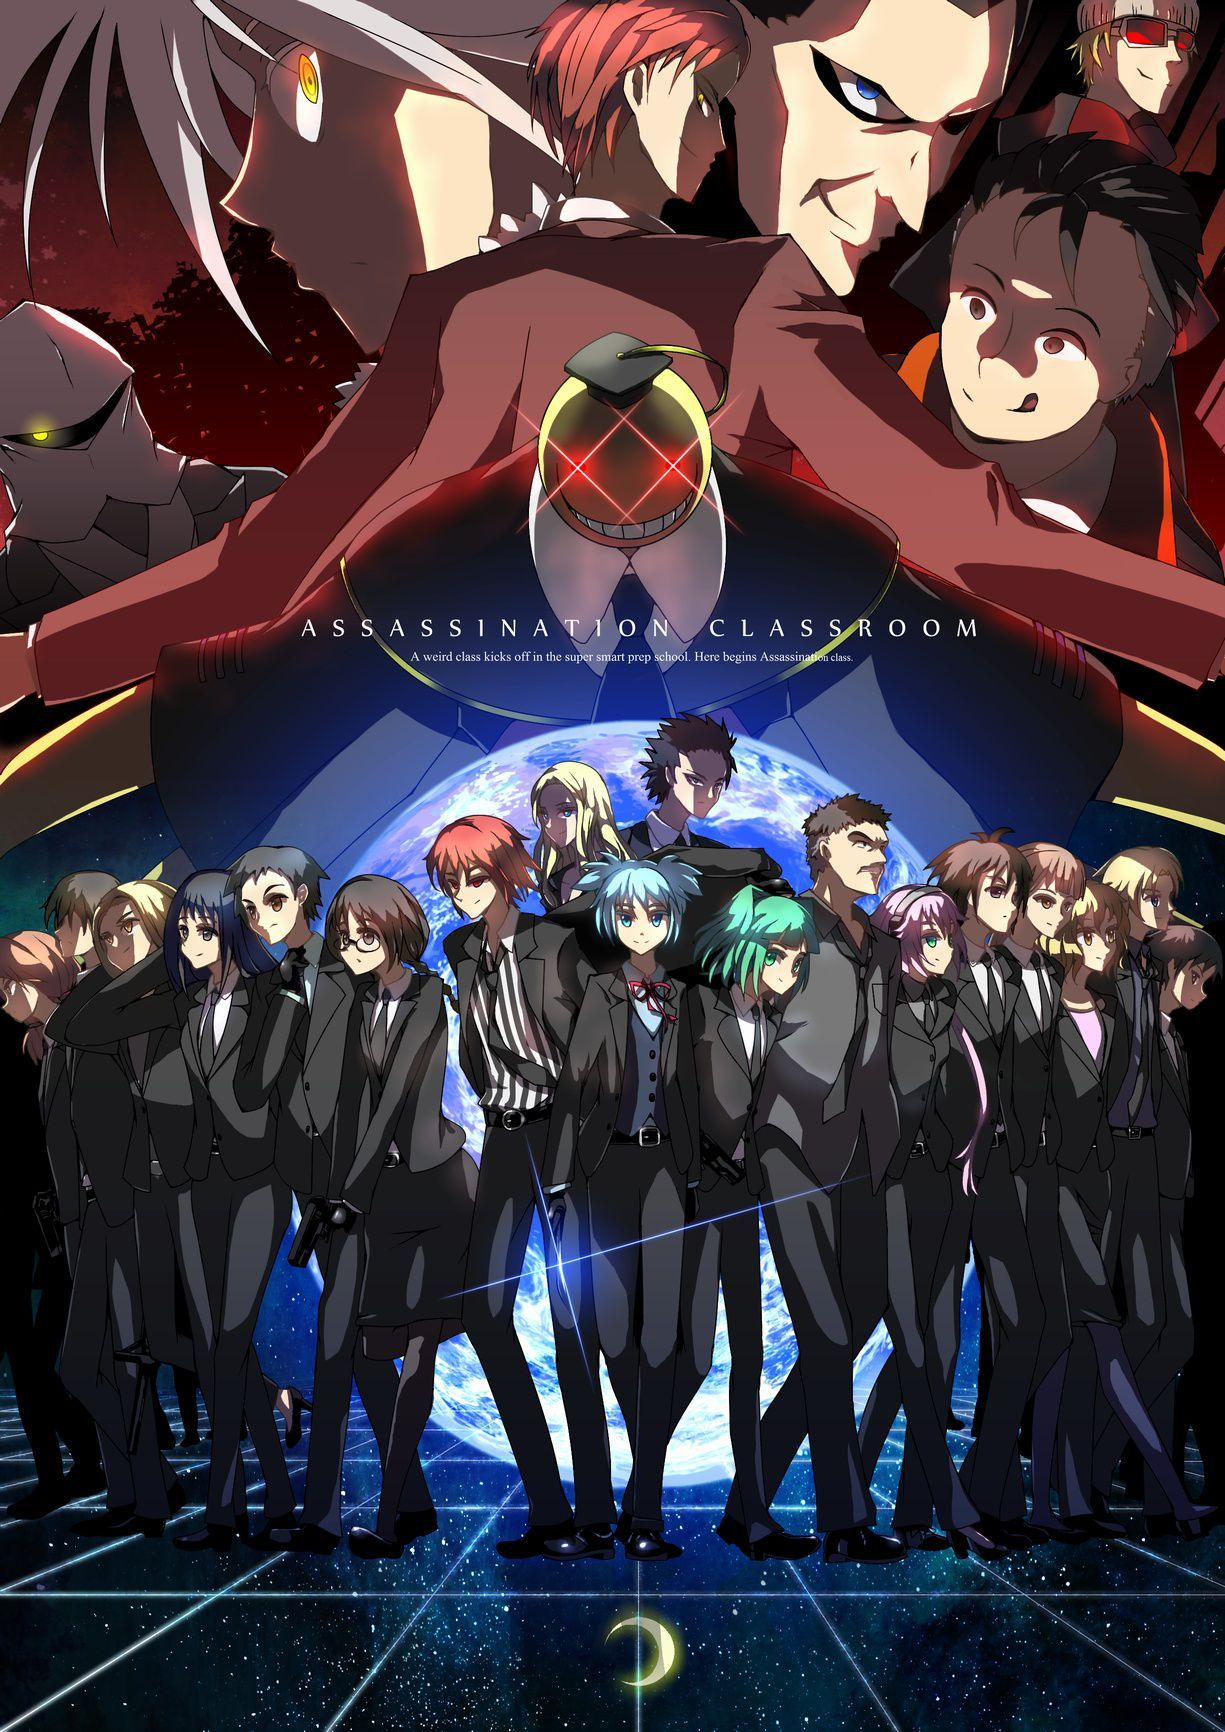 Karma X Oc Assassination Classroom Anime Drole Fond D Ecran Dessin Fan Art Anime